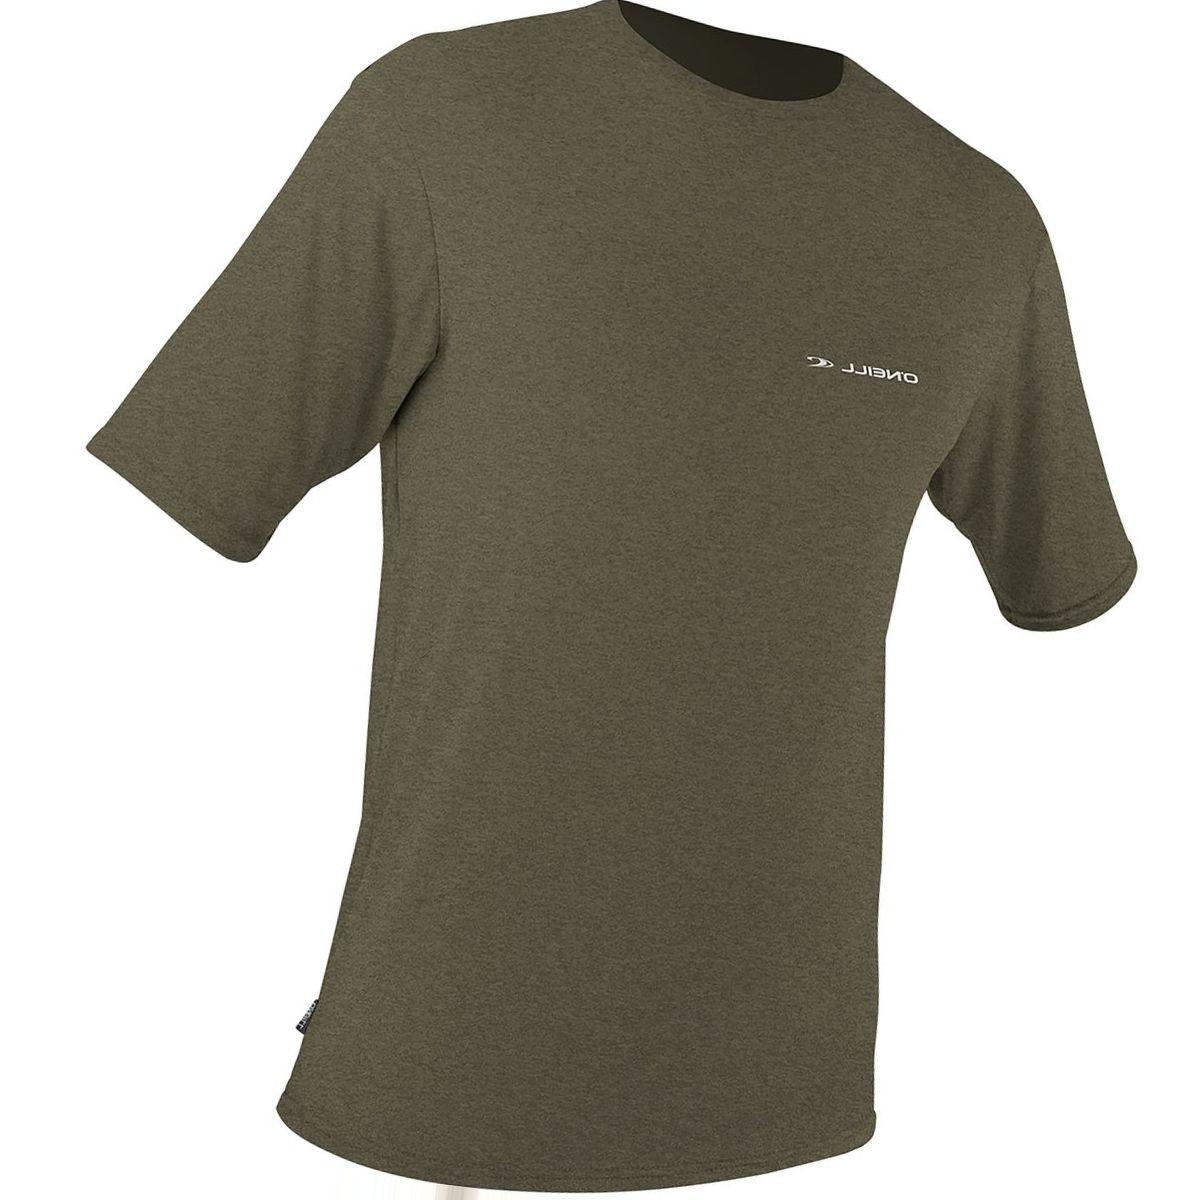 O'Neill Hybrid Surf Rashguard T-Shirt - Men's